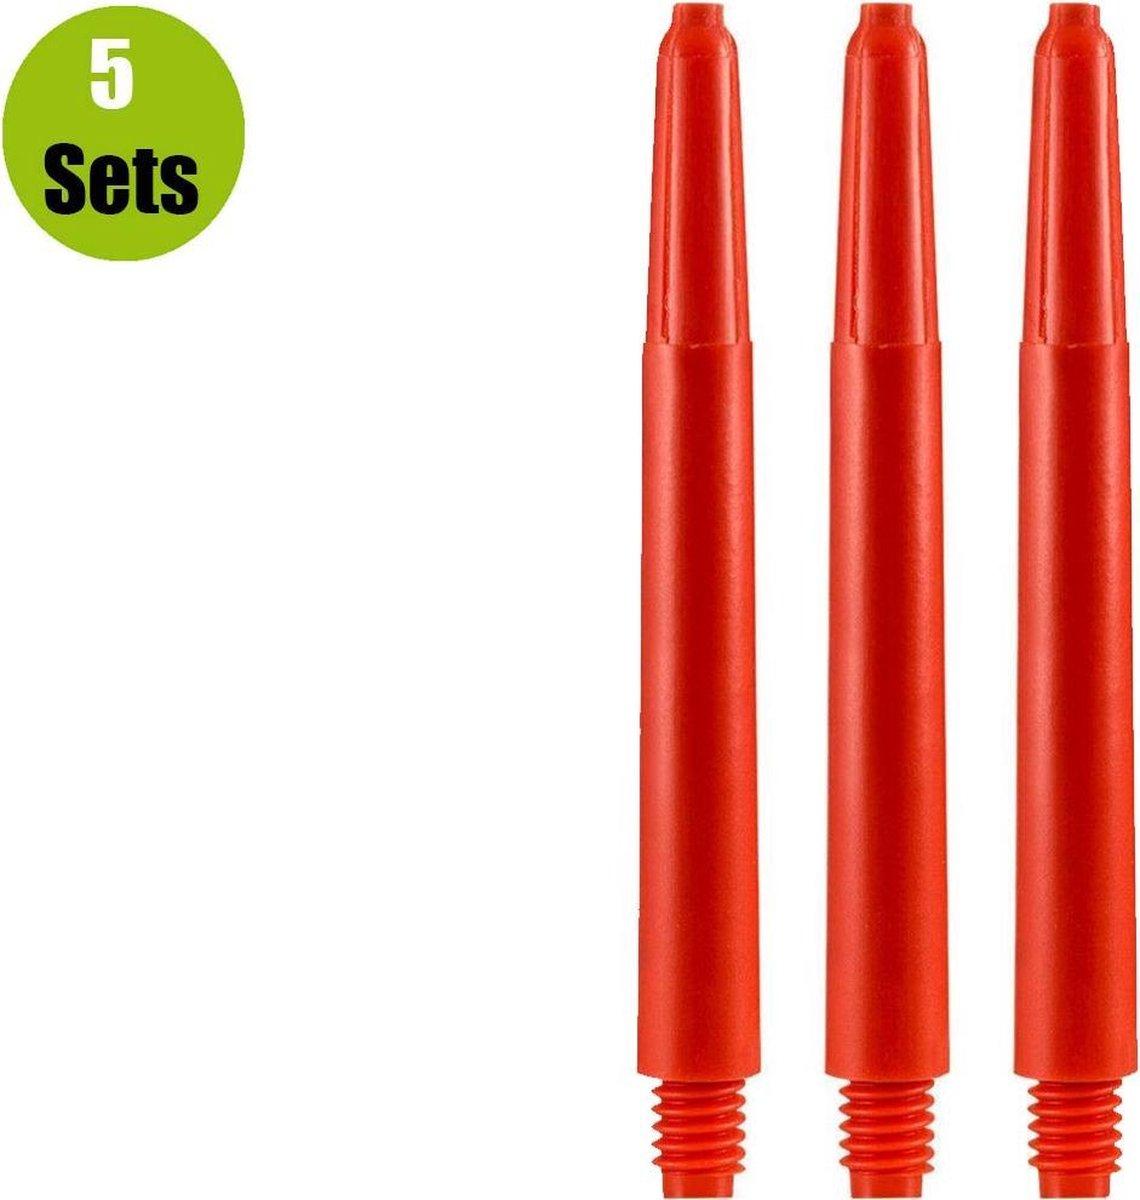 Nylon Dart Shafts - Rood - Short - (5 Sets)